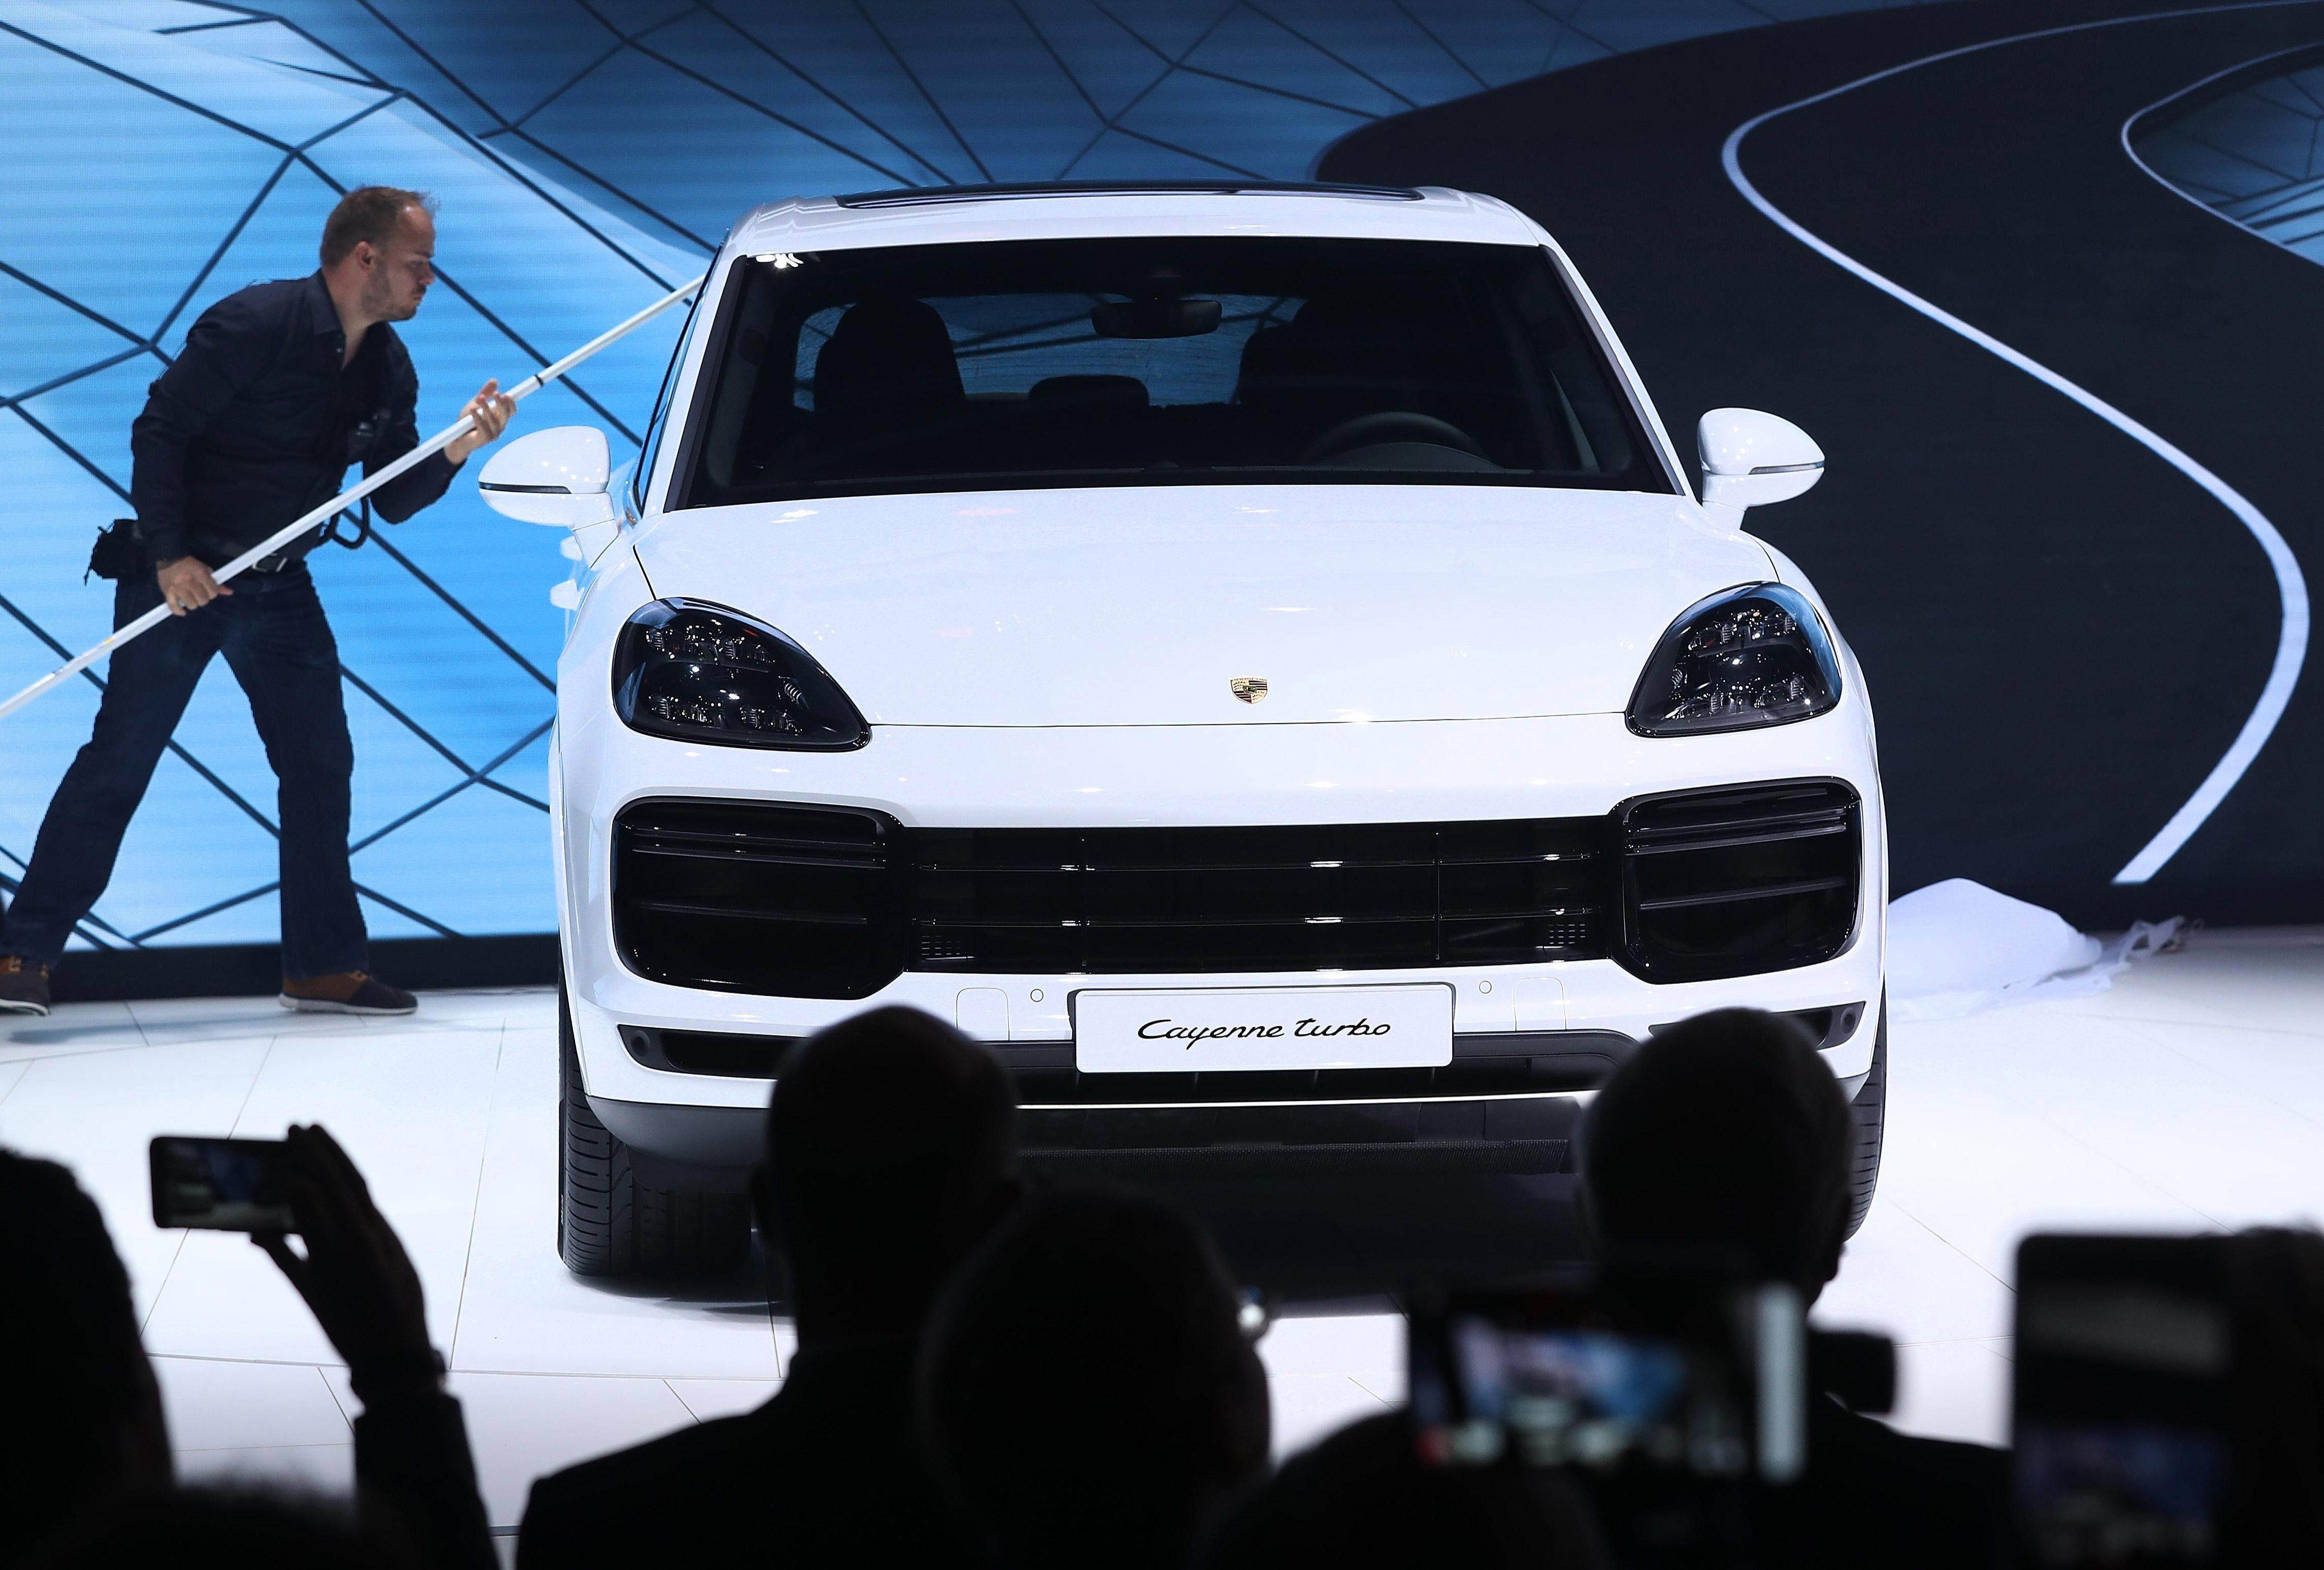 The stolen Porsche cost £50,000